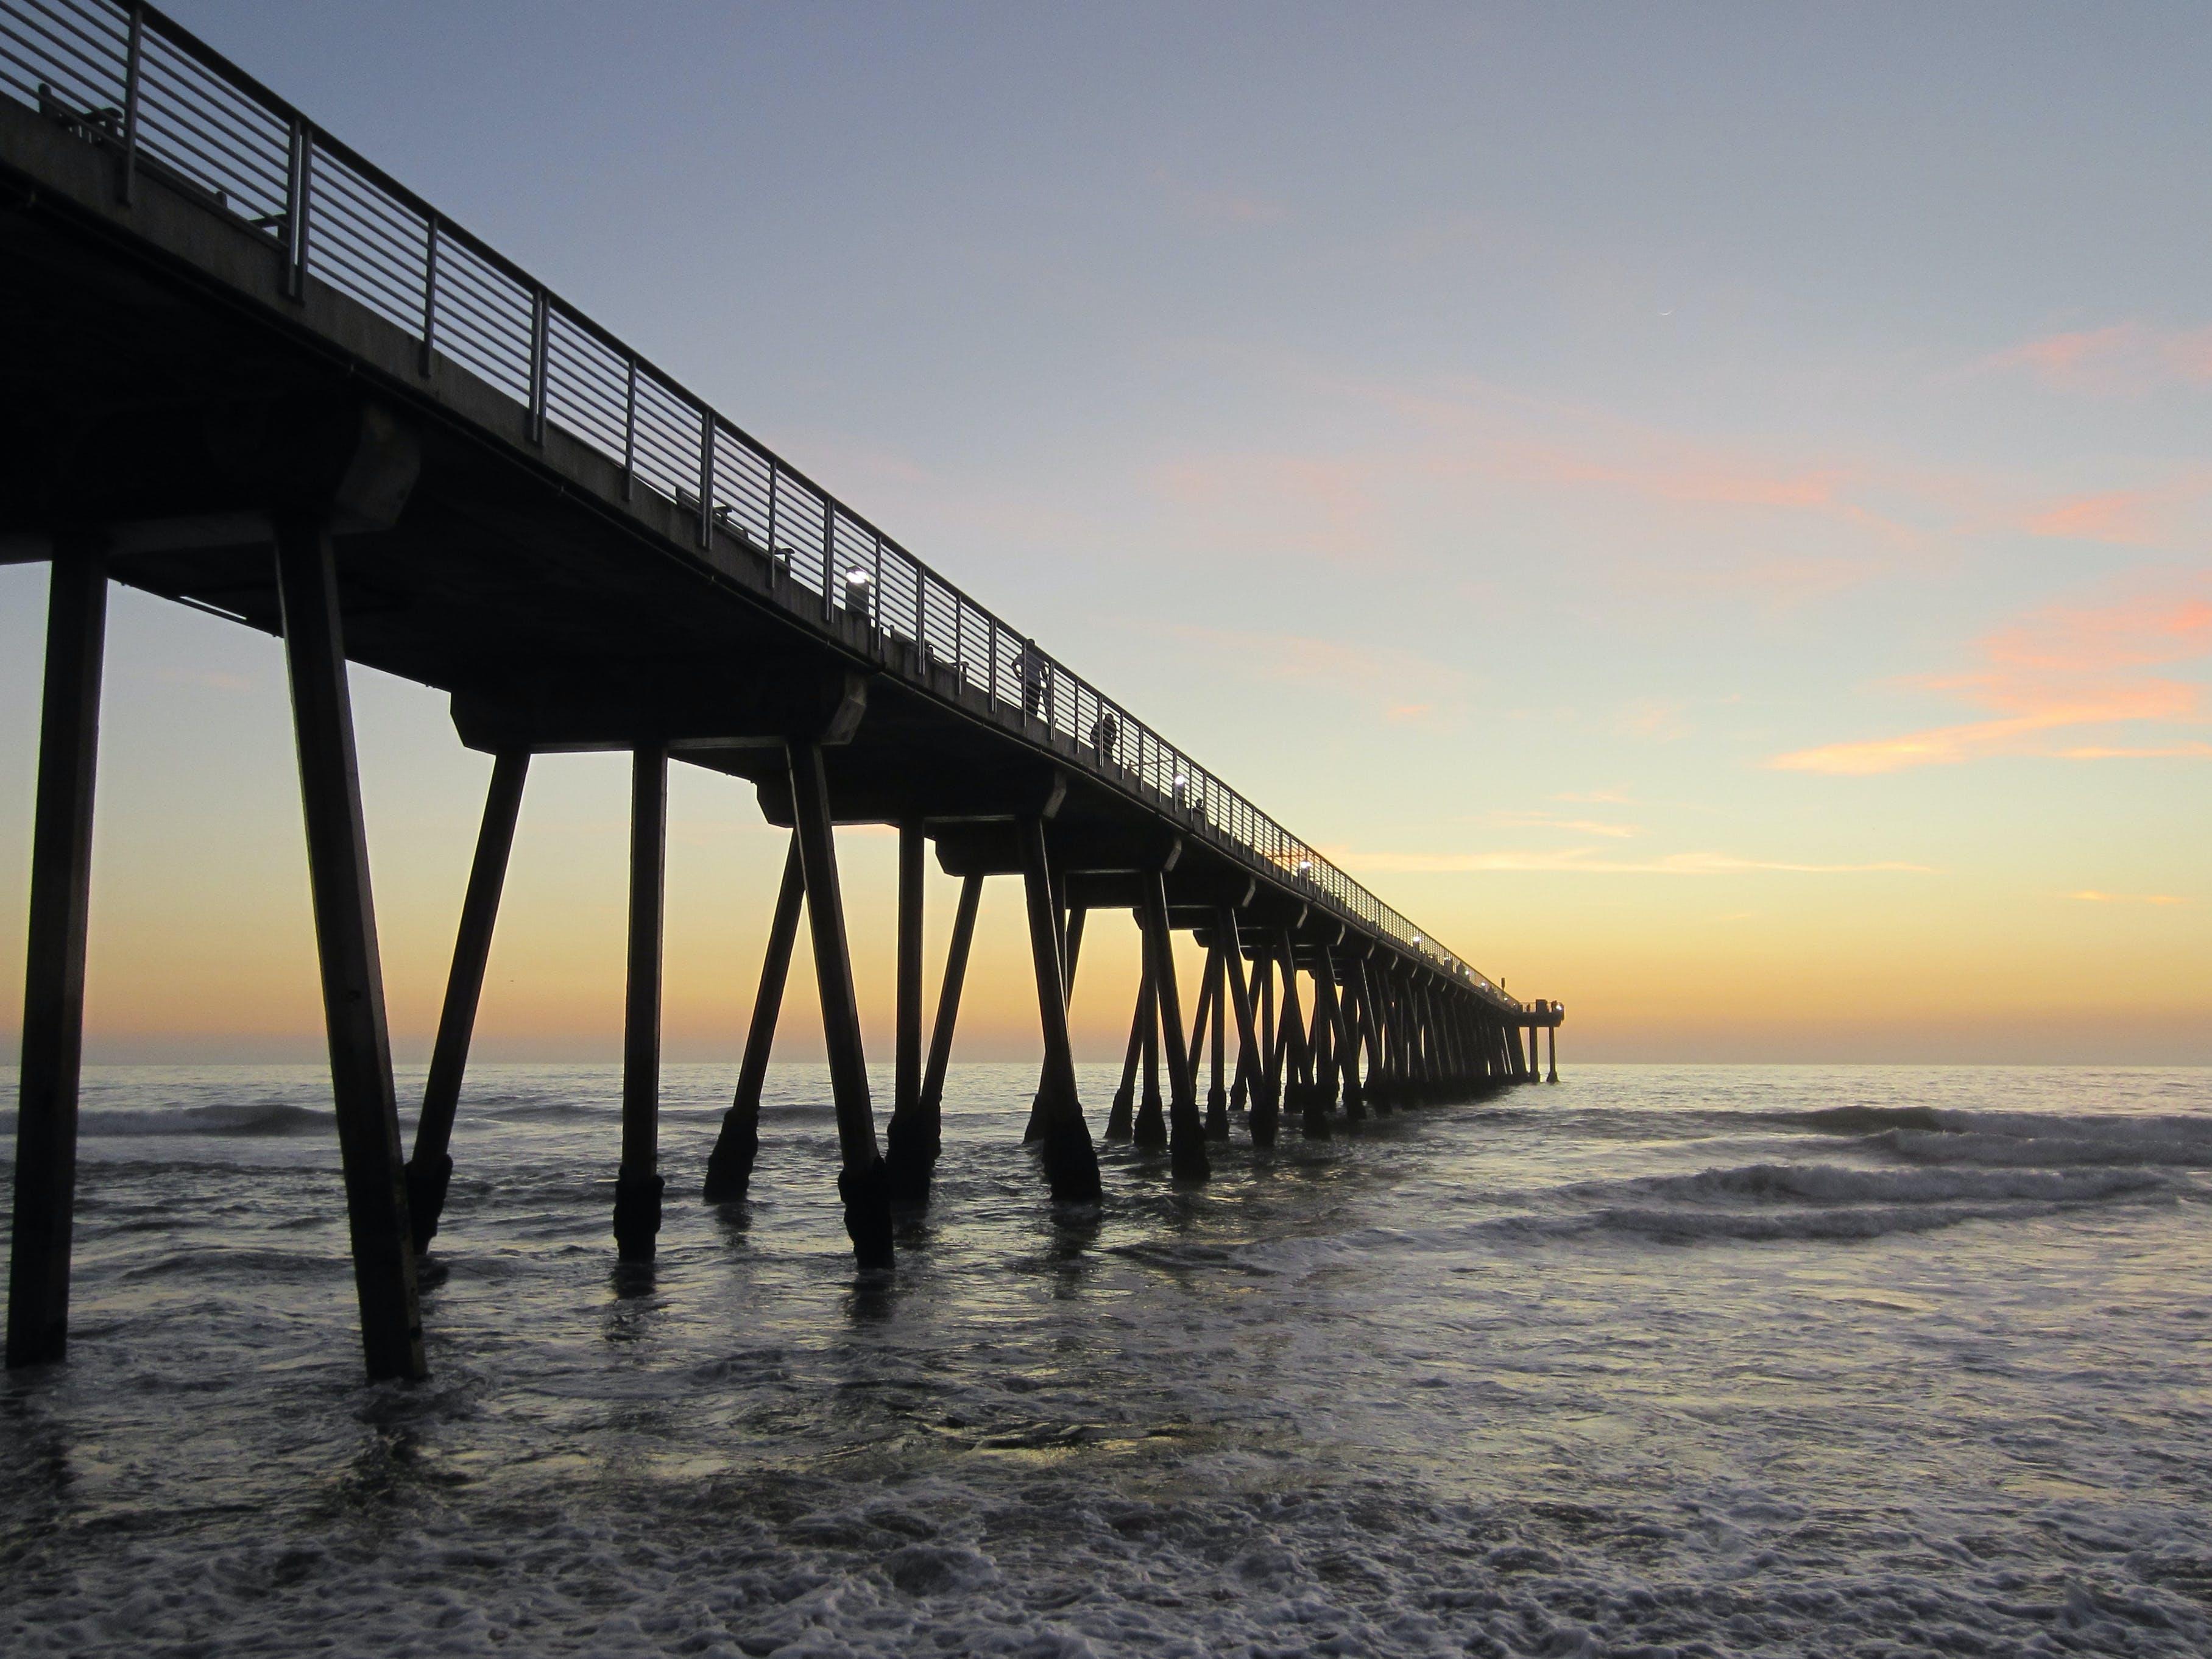 Kostenloses Stock Foto zu anlegestelle, meer, ozean